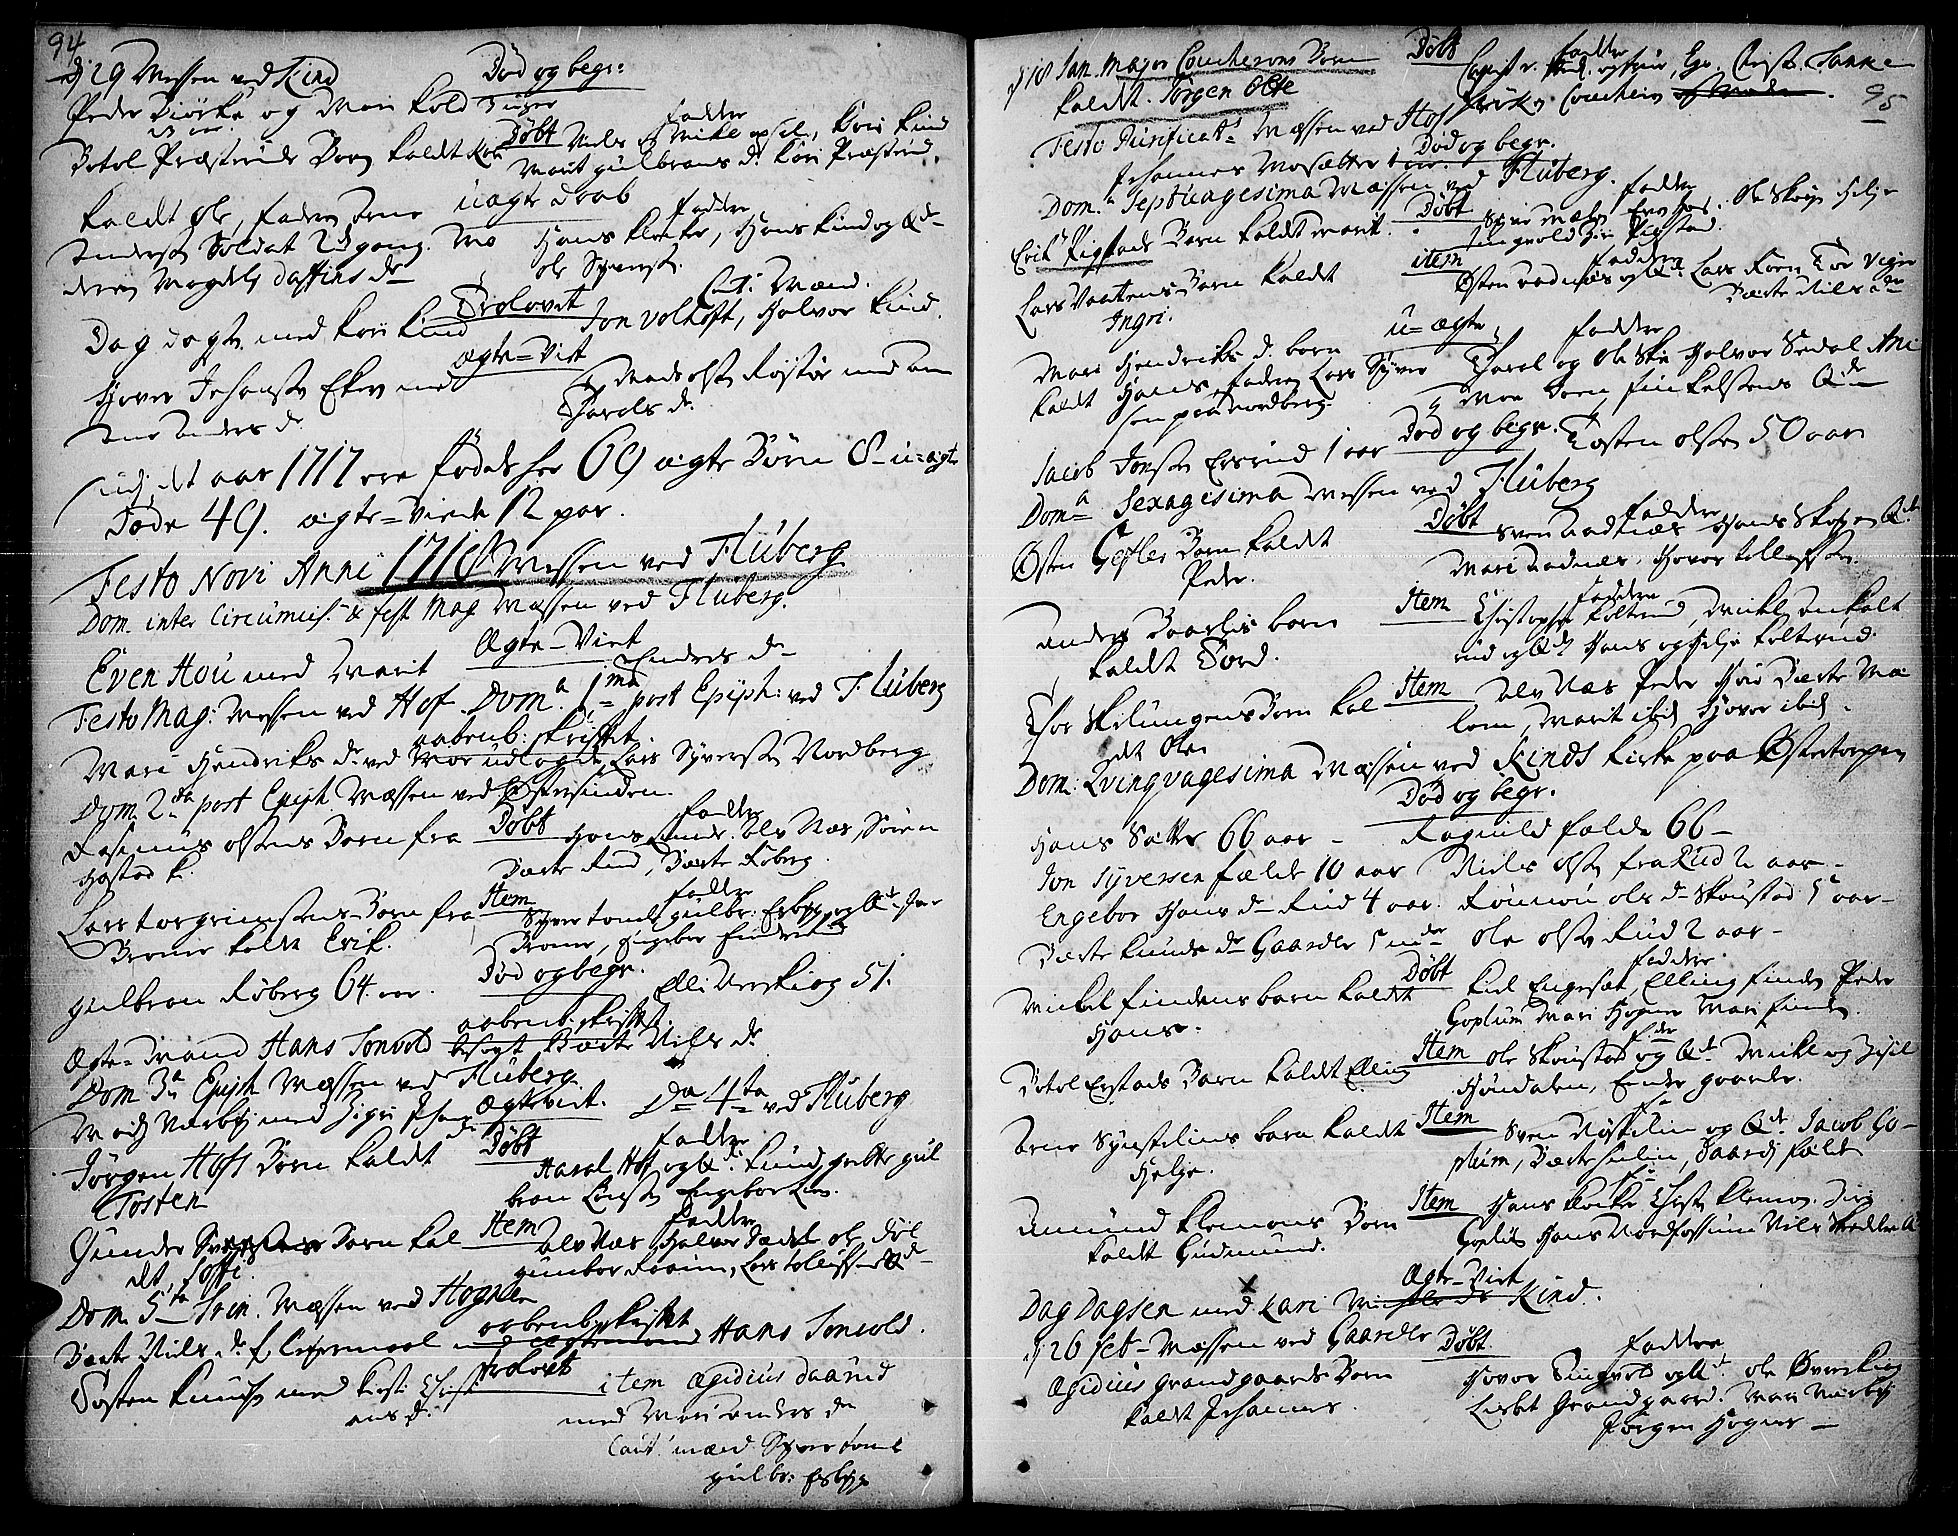 SAH, Land prestekontor, Ministerialbok nr. 1, 1708-1732, s. 94-95